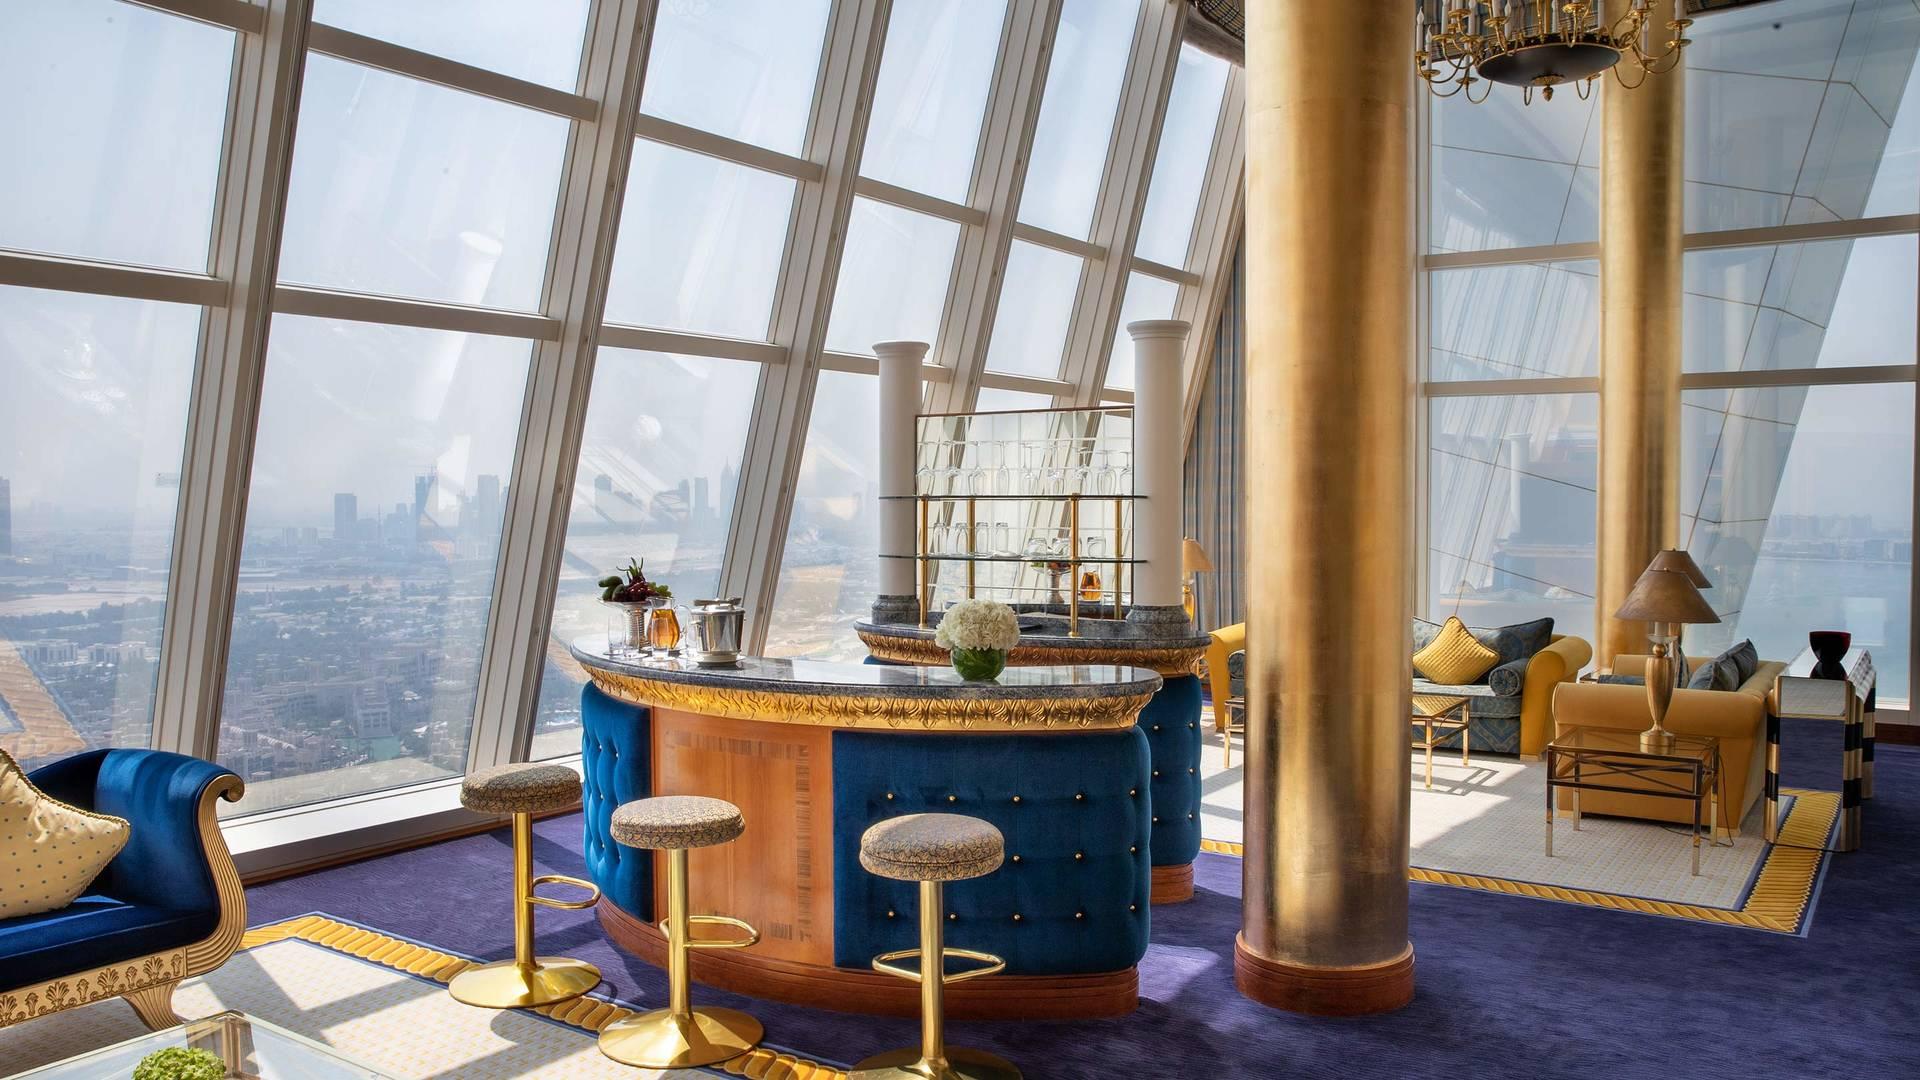 Jumeirah Burj Al Arab Club suite livingroom_16-9